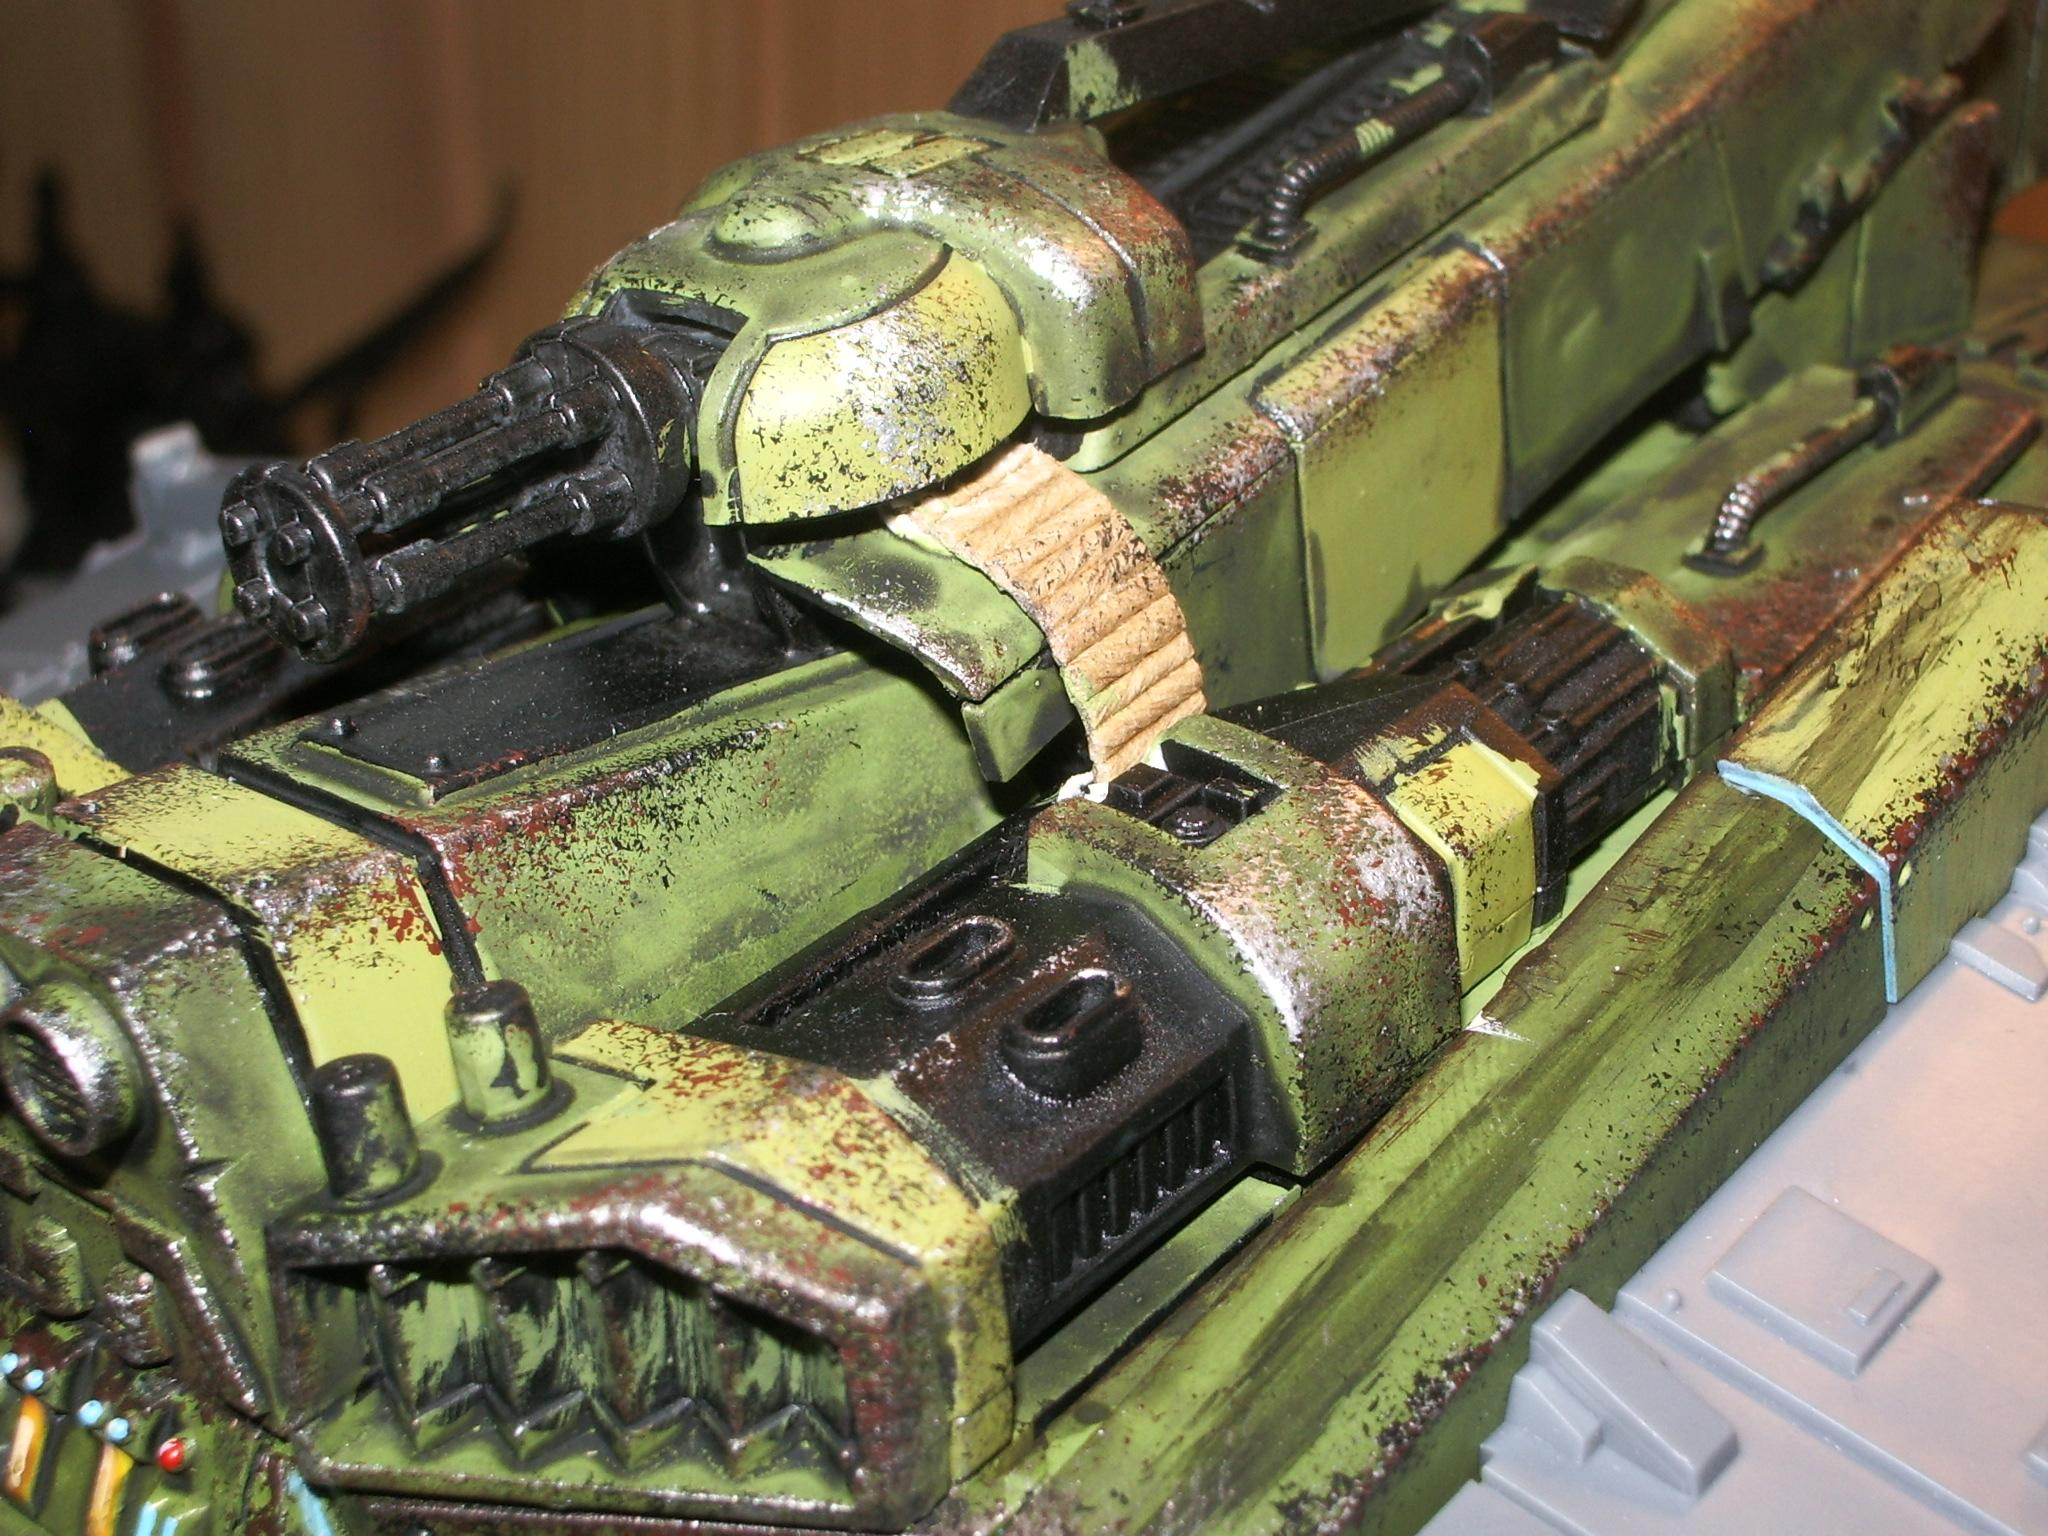 Conversion, Greenstuff, Halo, Imperial Guard, Piranah, Tau, Valkyrie, Warhammer 40,000